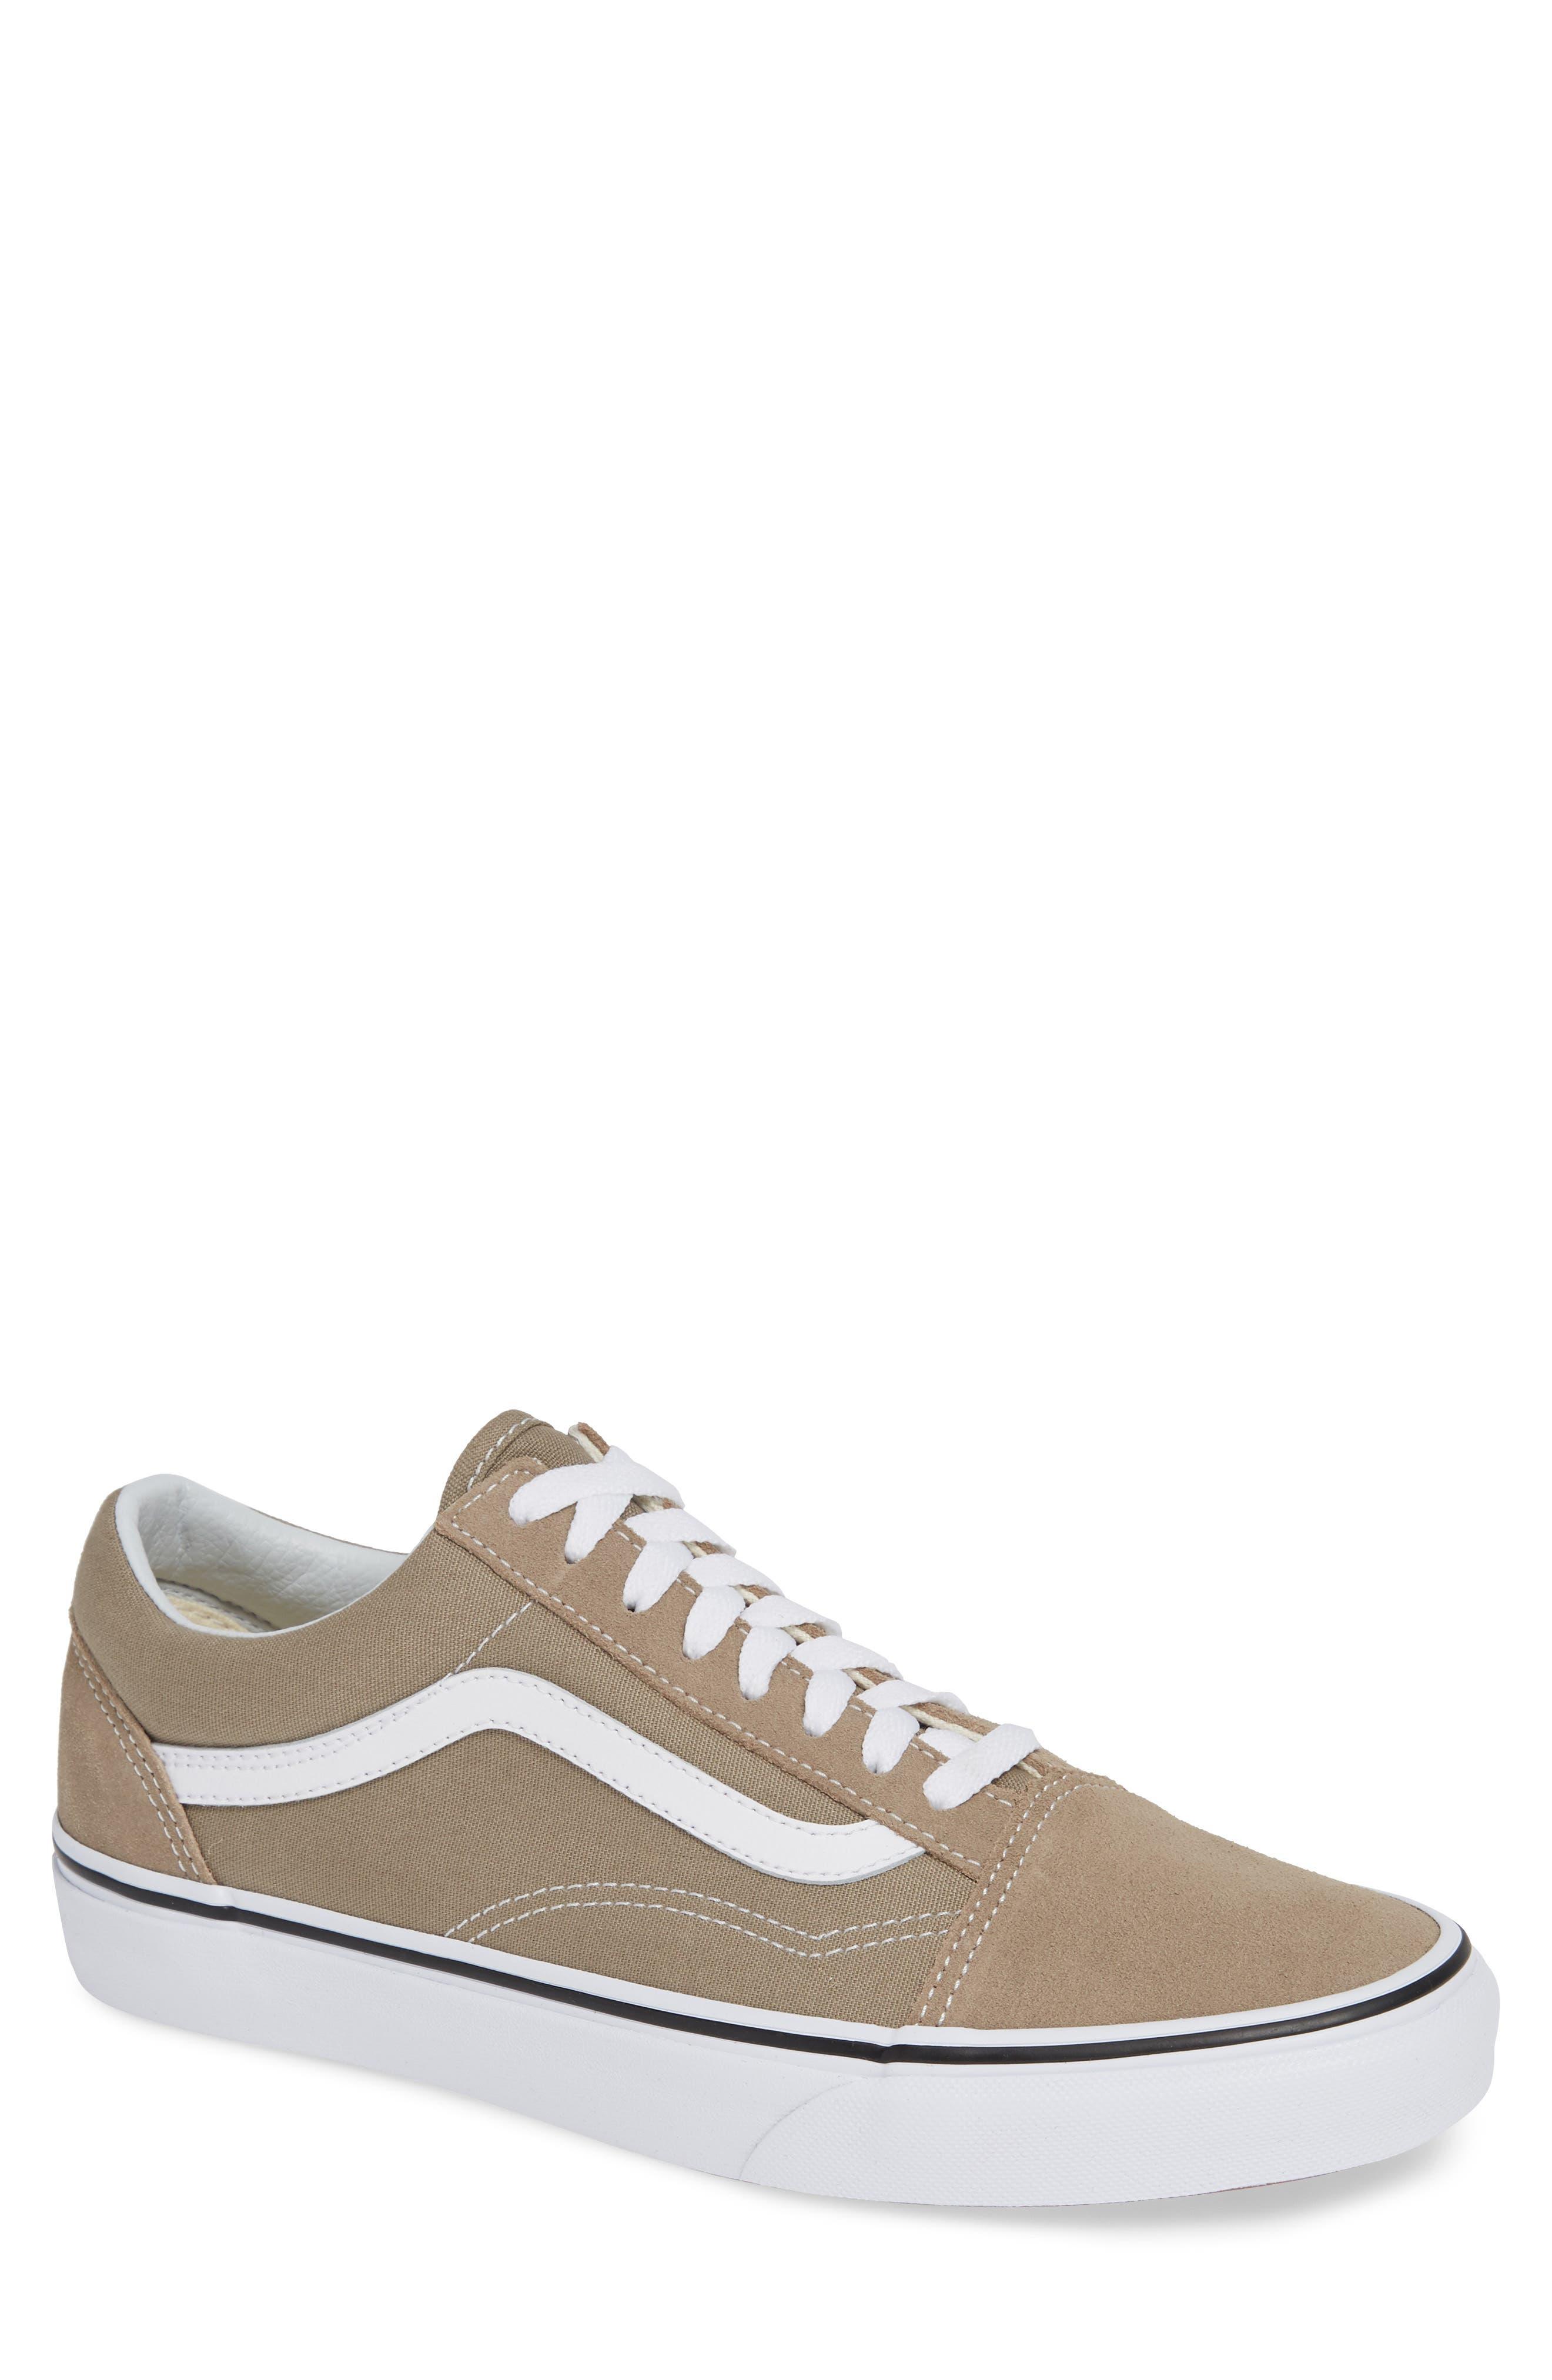 'Old Skool' Sneaker,                             Main thumbnail 1, color,                             DESERT TAUPE/ WHITE CANVAS